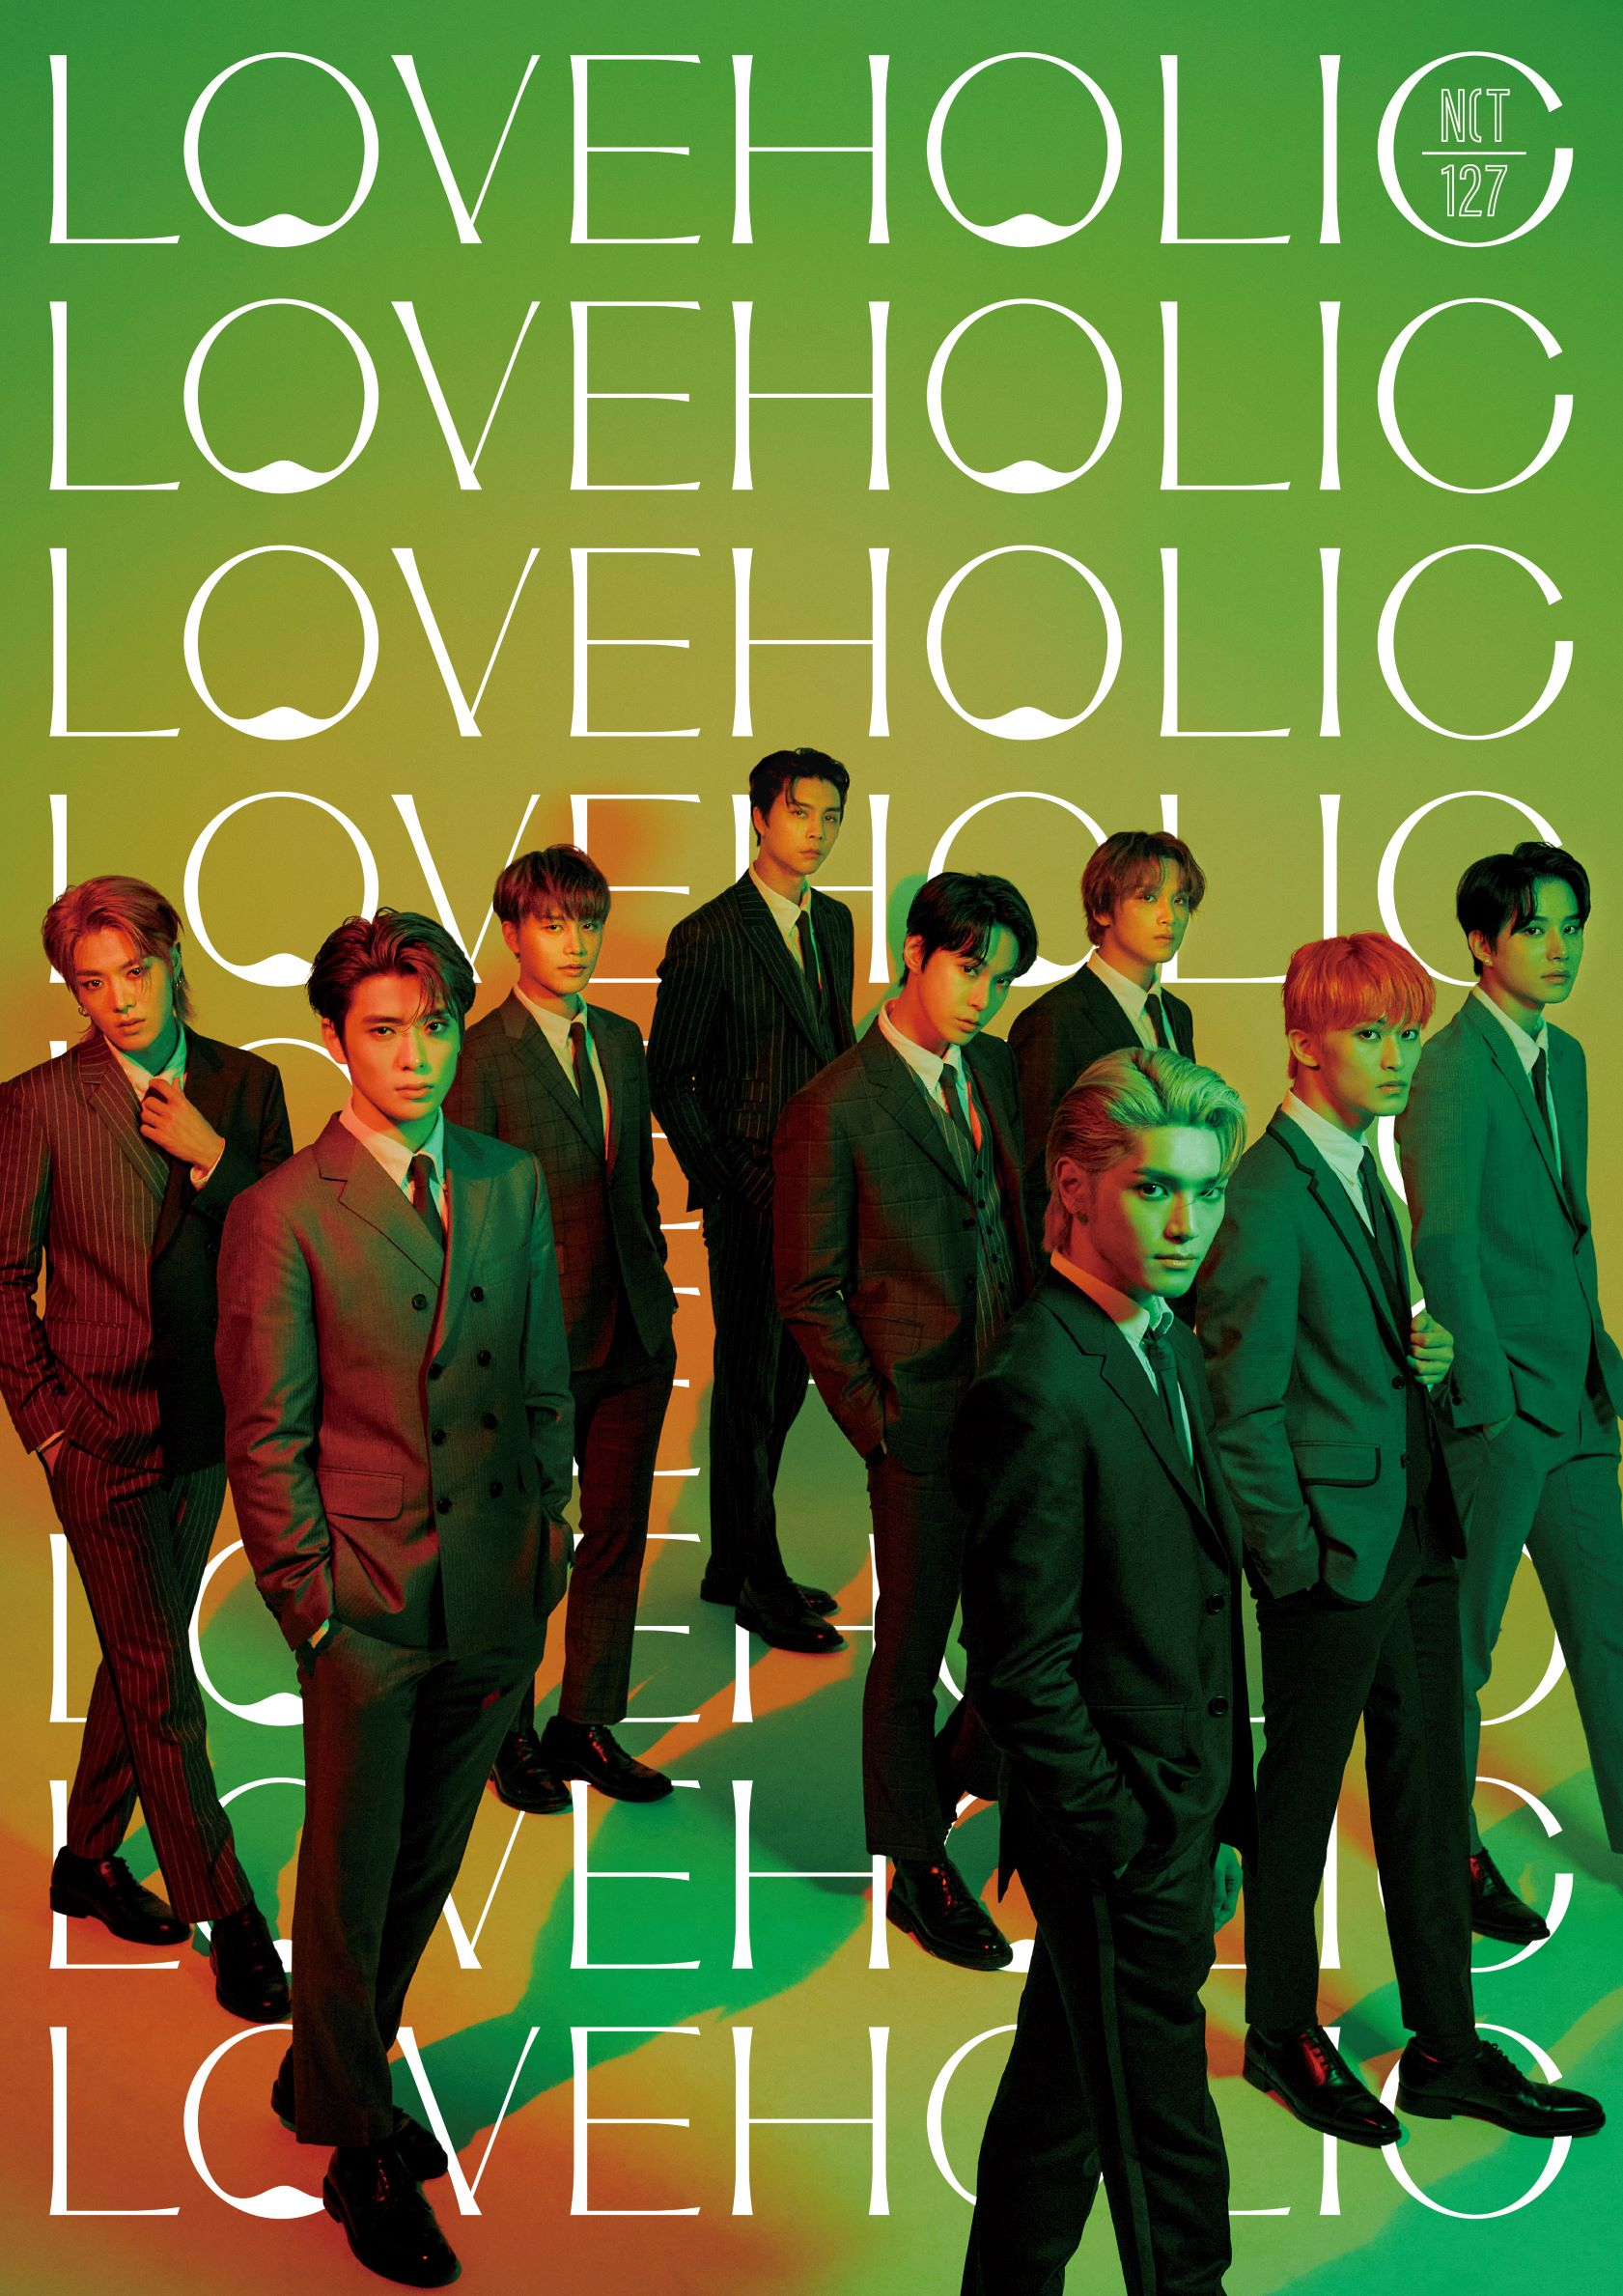 NCT 127 Japan 2nd Mini ALBUM 『LOVEHOLIC』